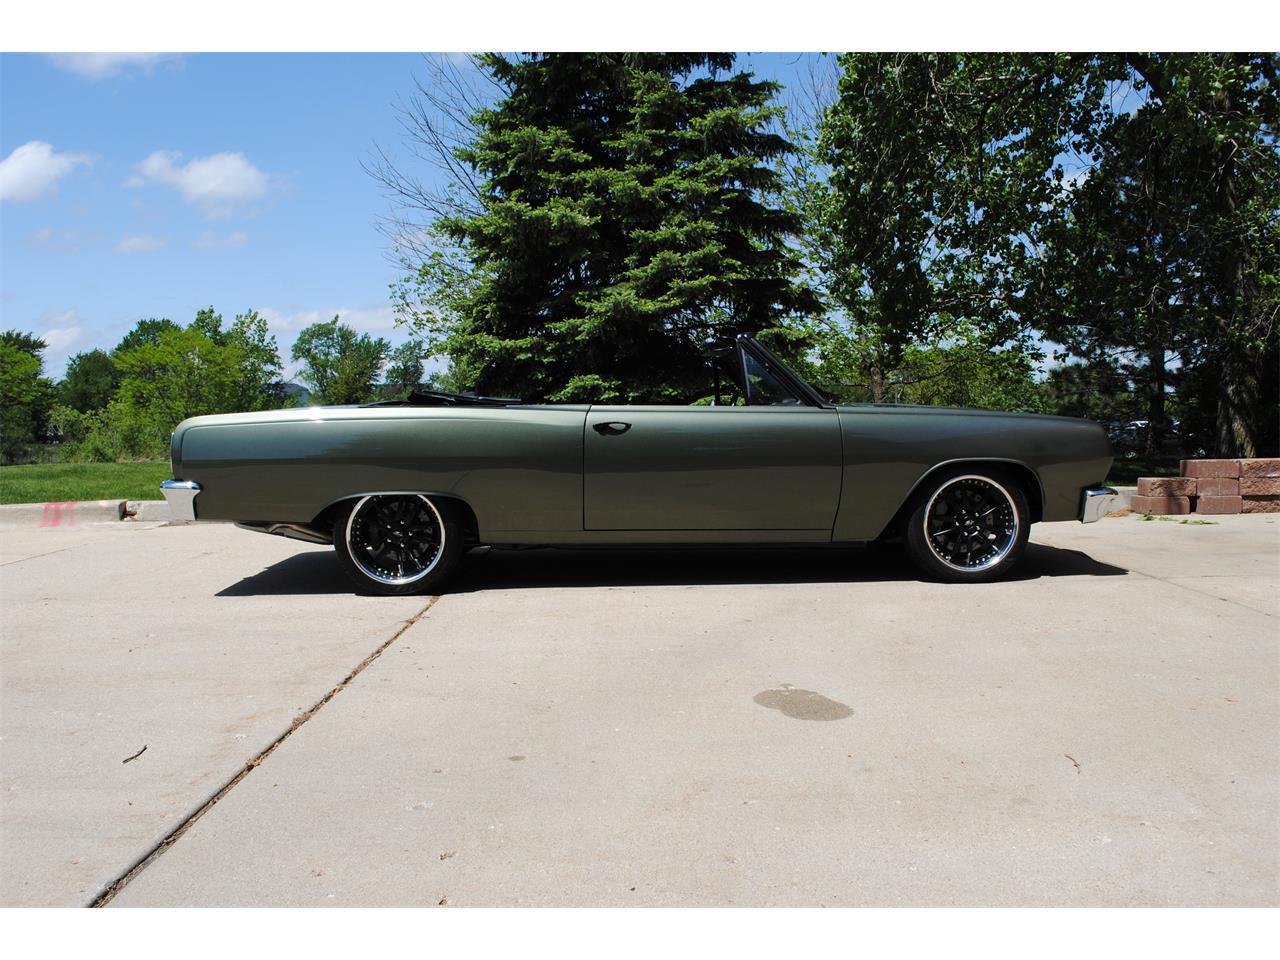 1965 Chevrolet Chevelle Malibu Ss Convertible For Sale